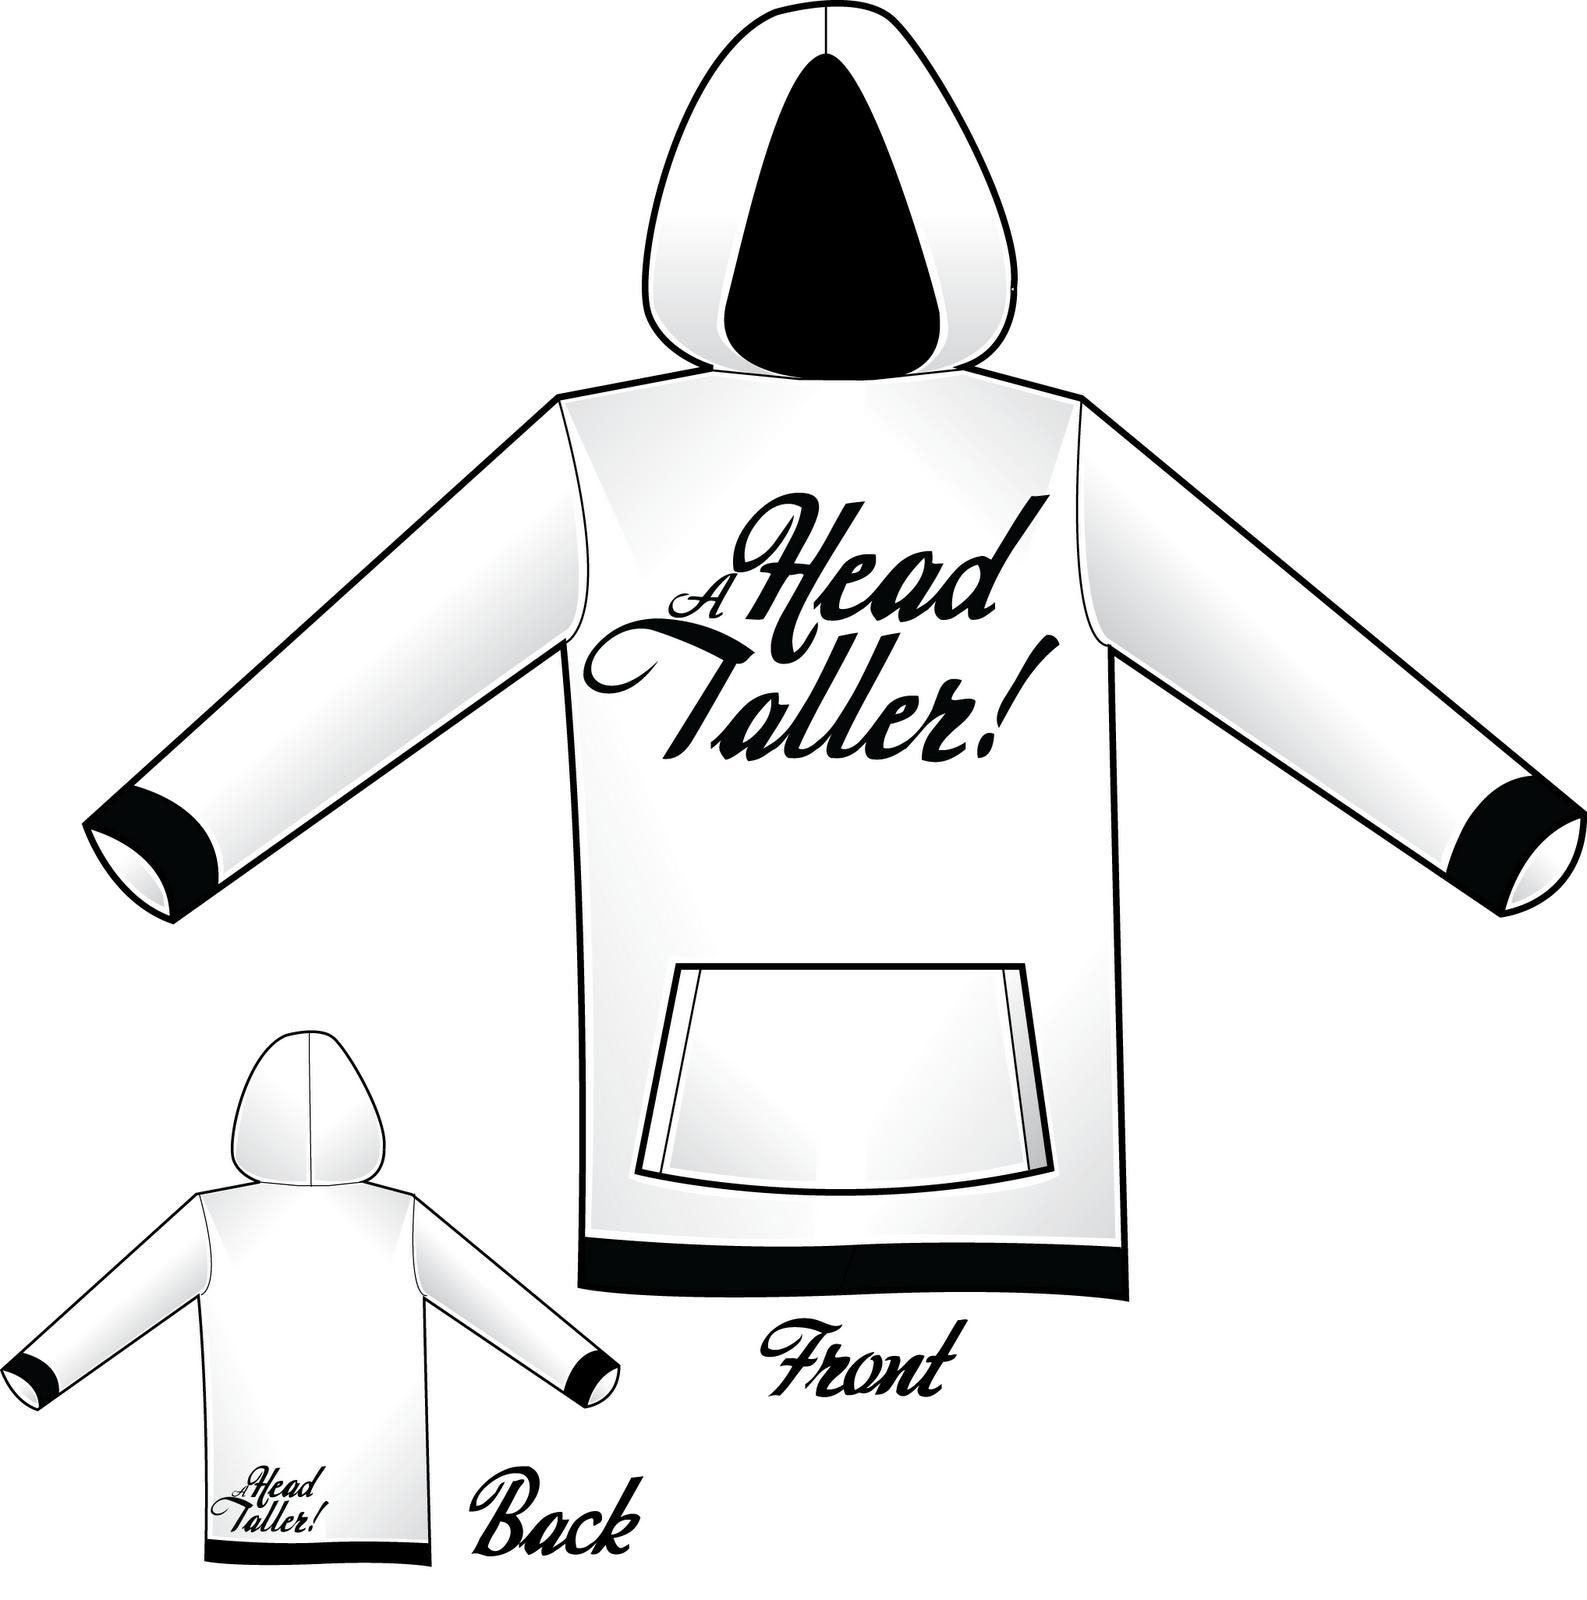 Shirt hoodie design - Thanks